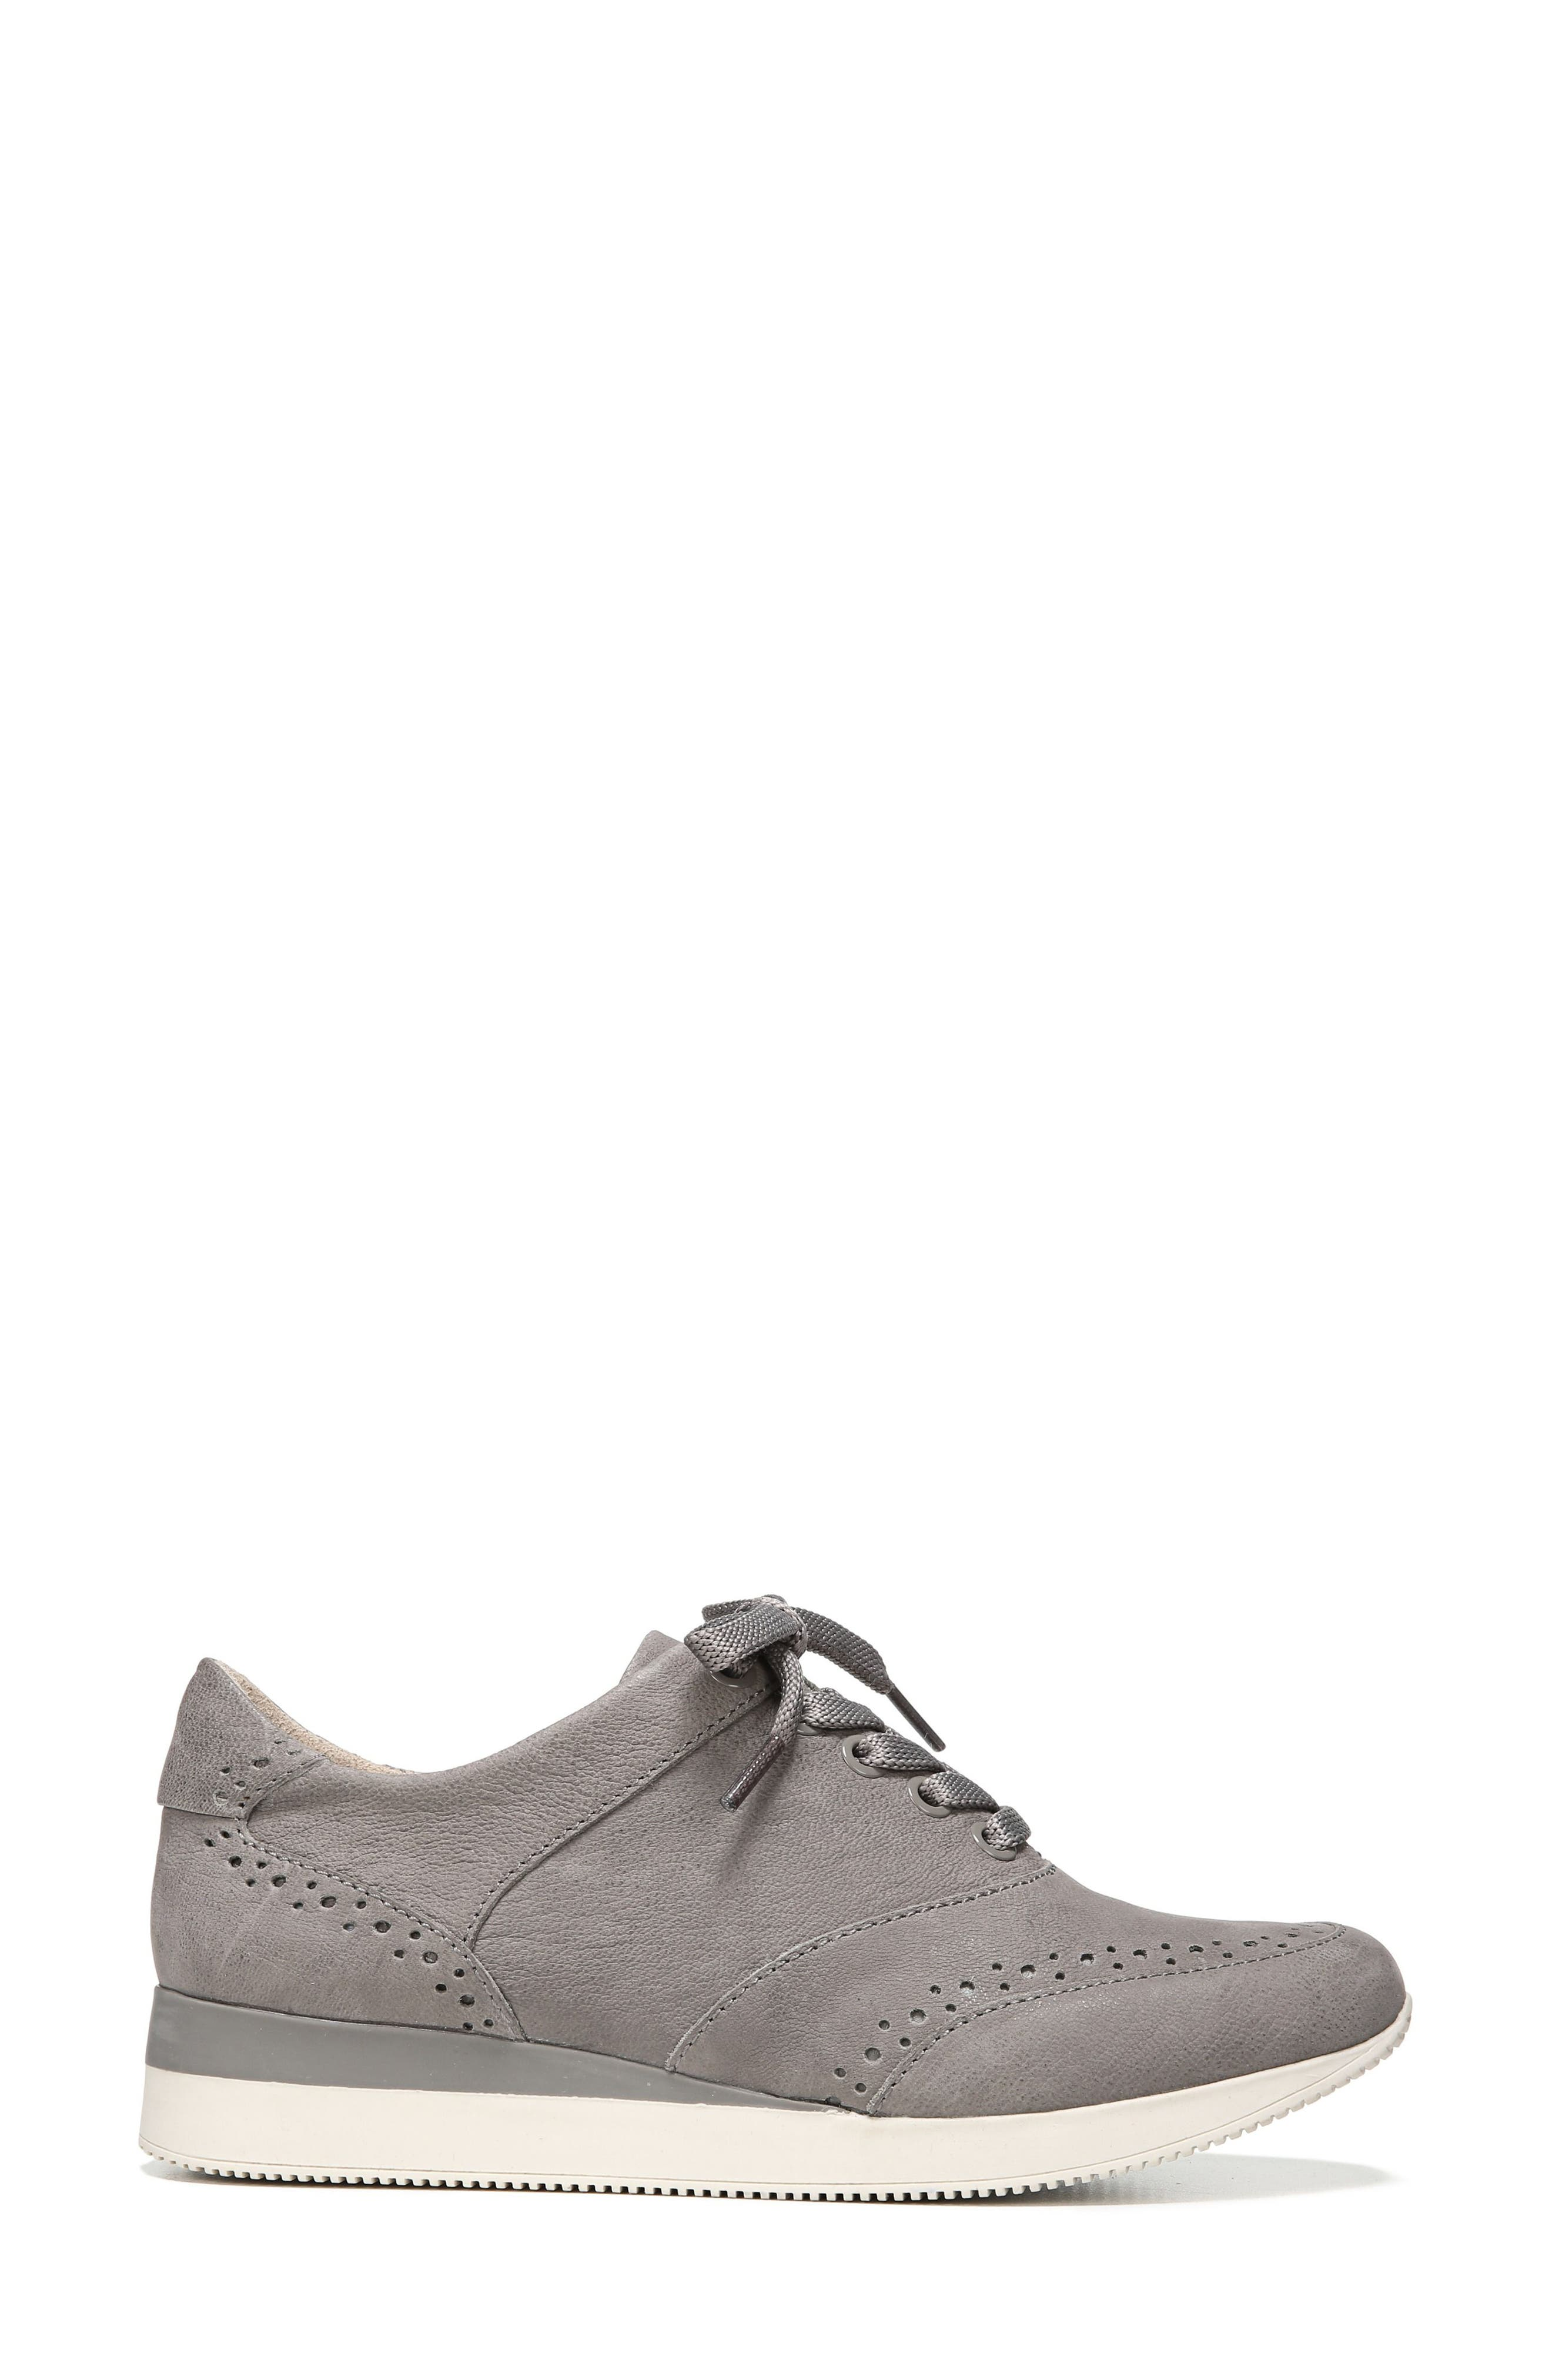 Jimi 2 Perforated Sneaker,                             Alternate thumbnail 3, color,                             Modern Grey Nubuck Leather